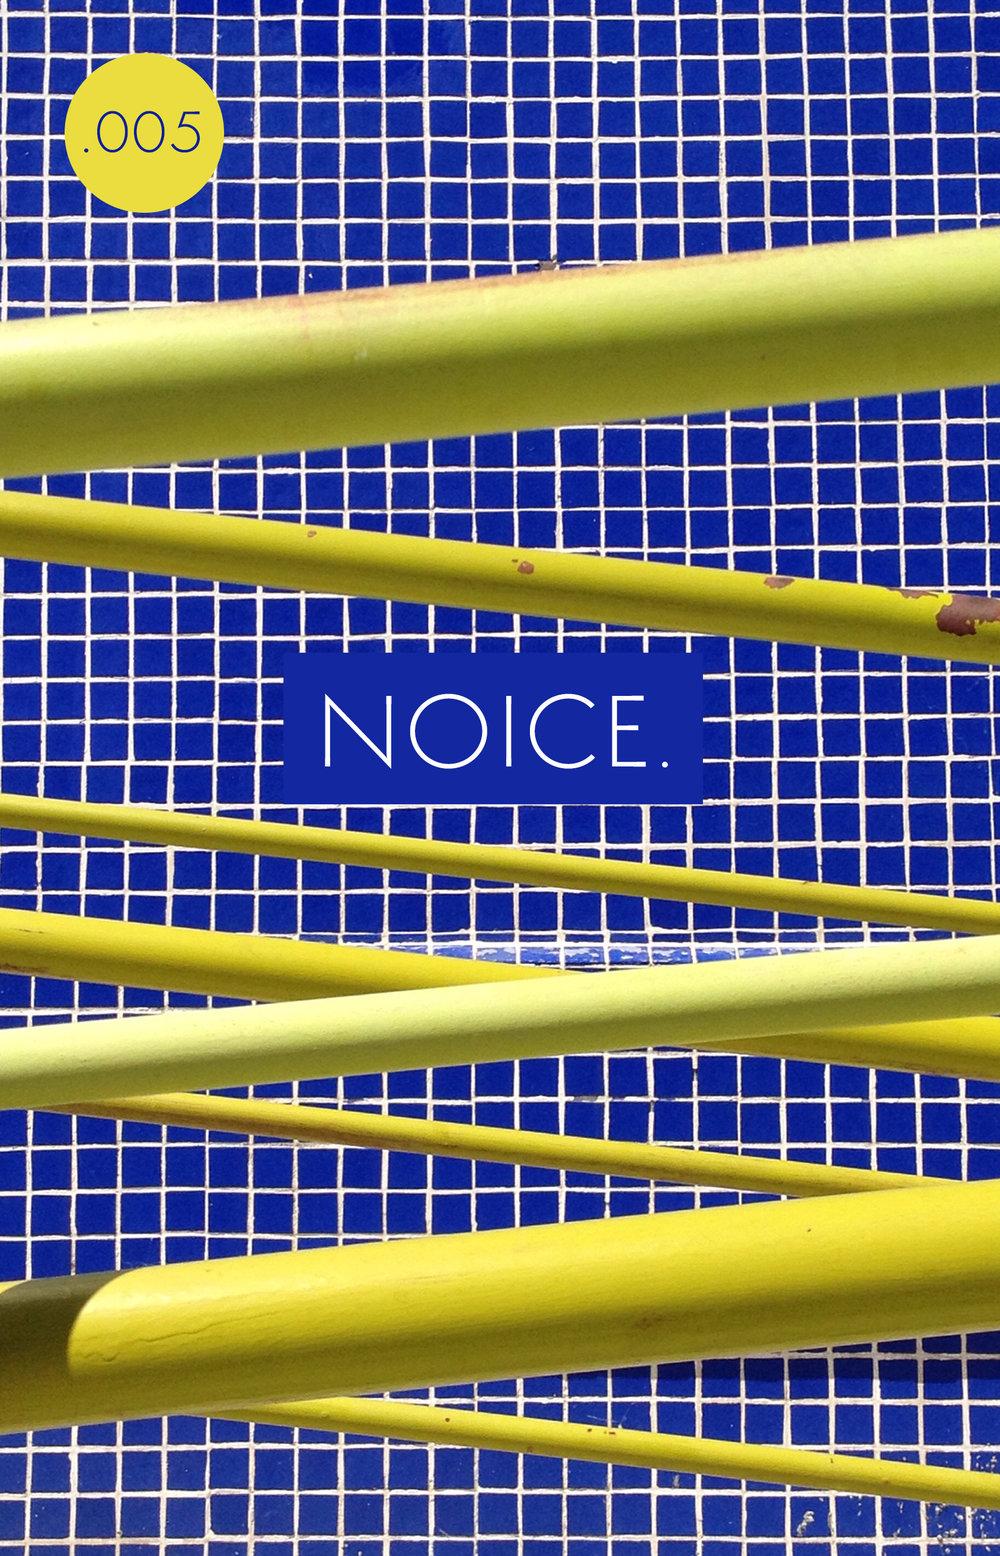 Noice Yellow Issue .jpg